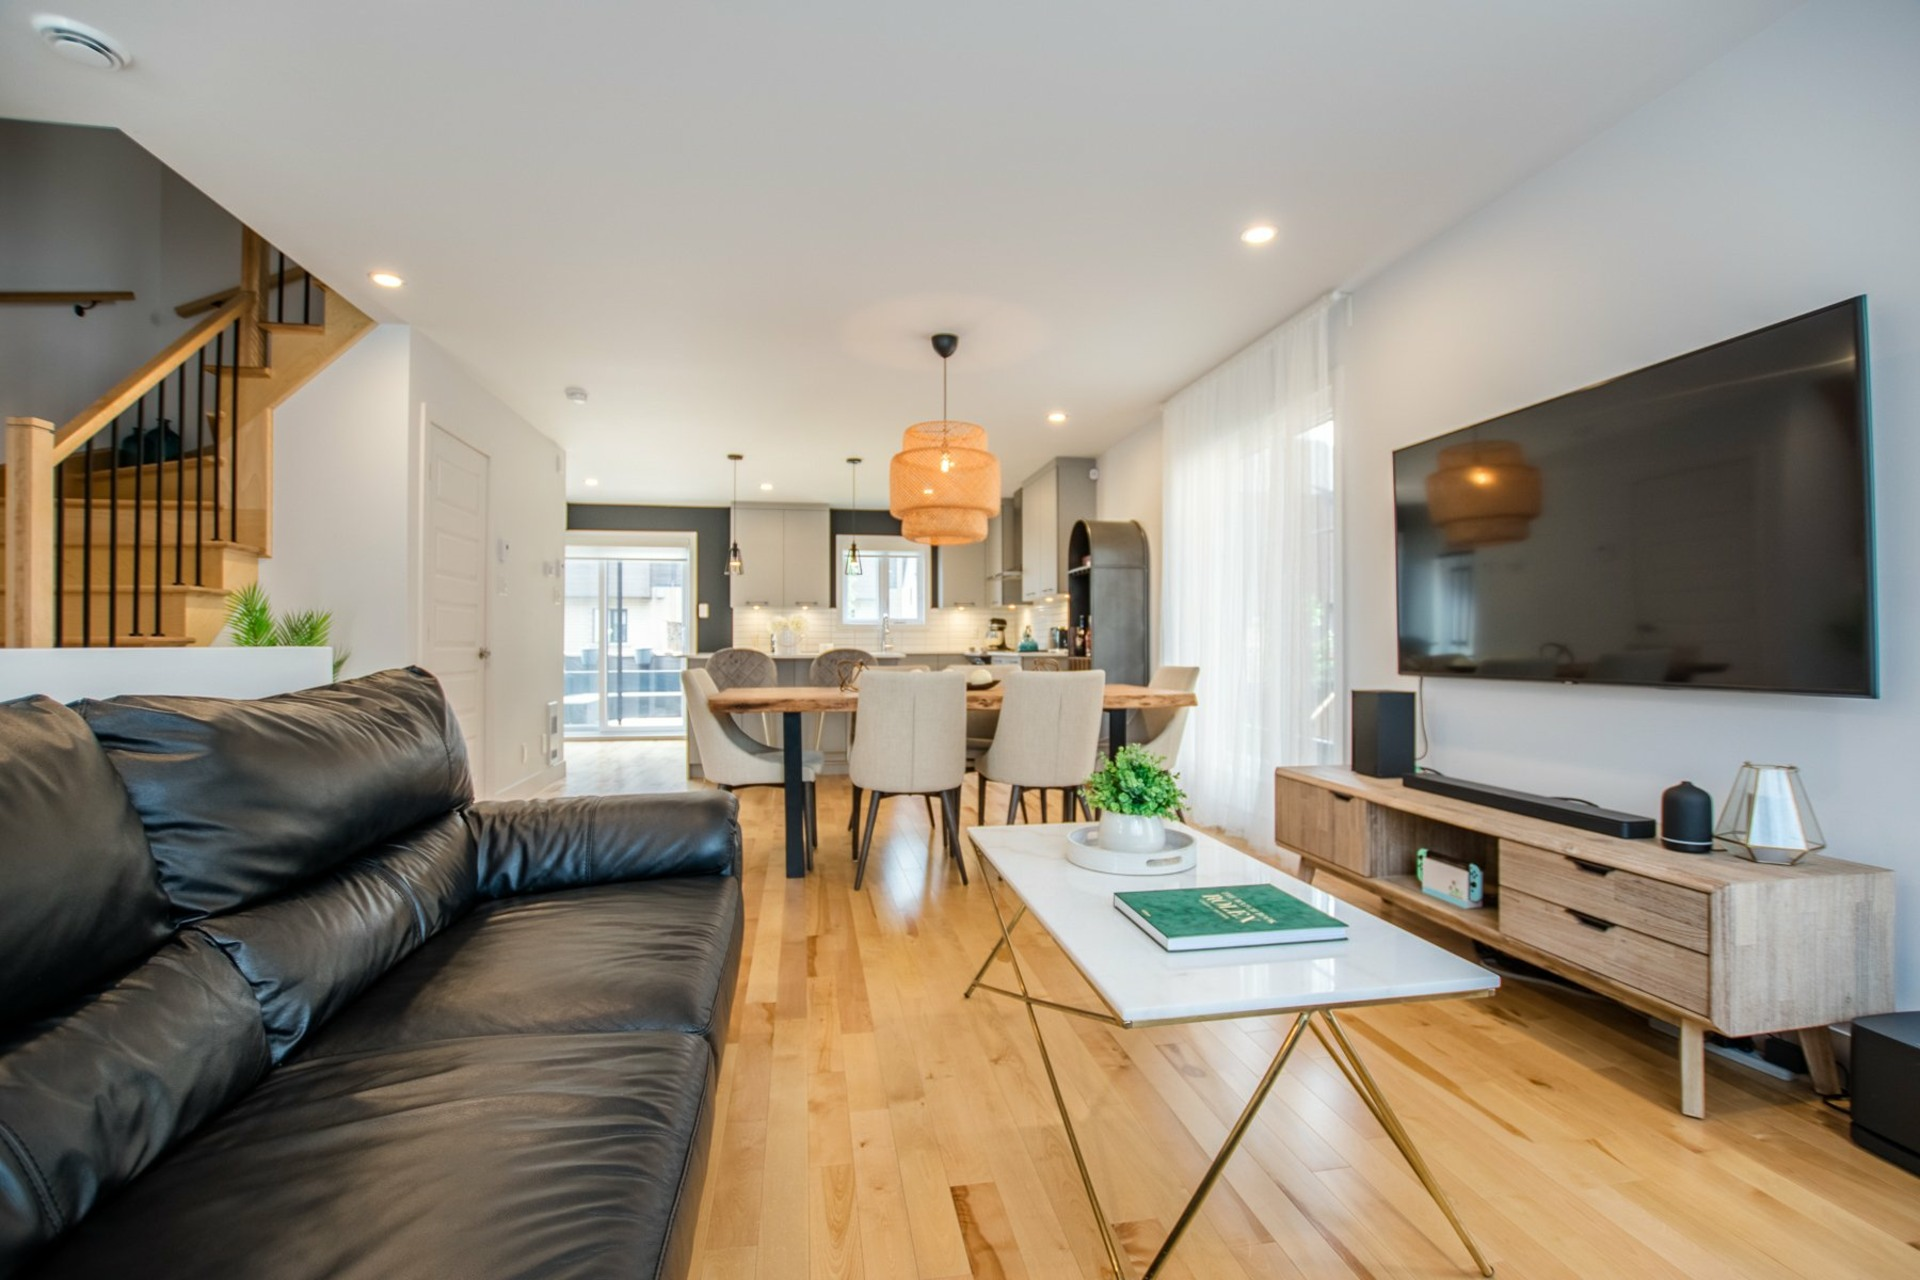 image 8 - MX - Casa sola - MX En venta Saint-Constant - 10 habitaciones